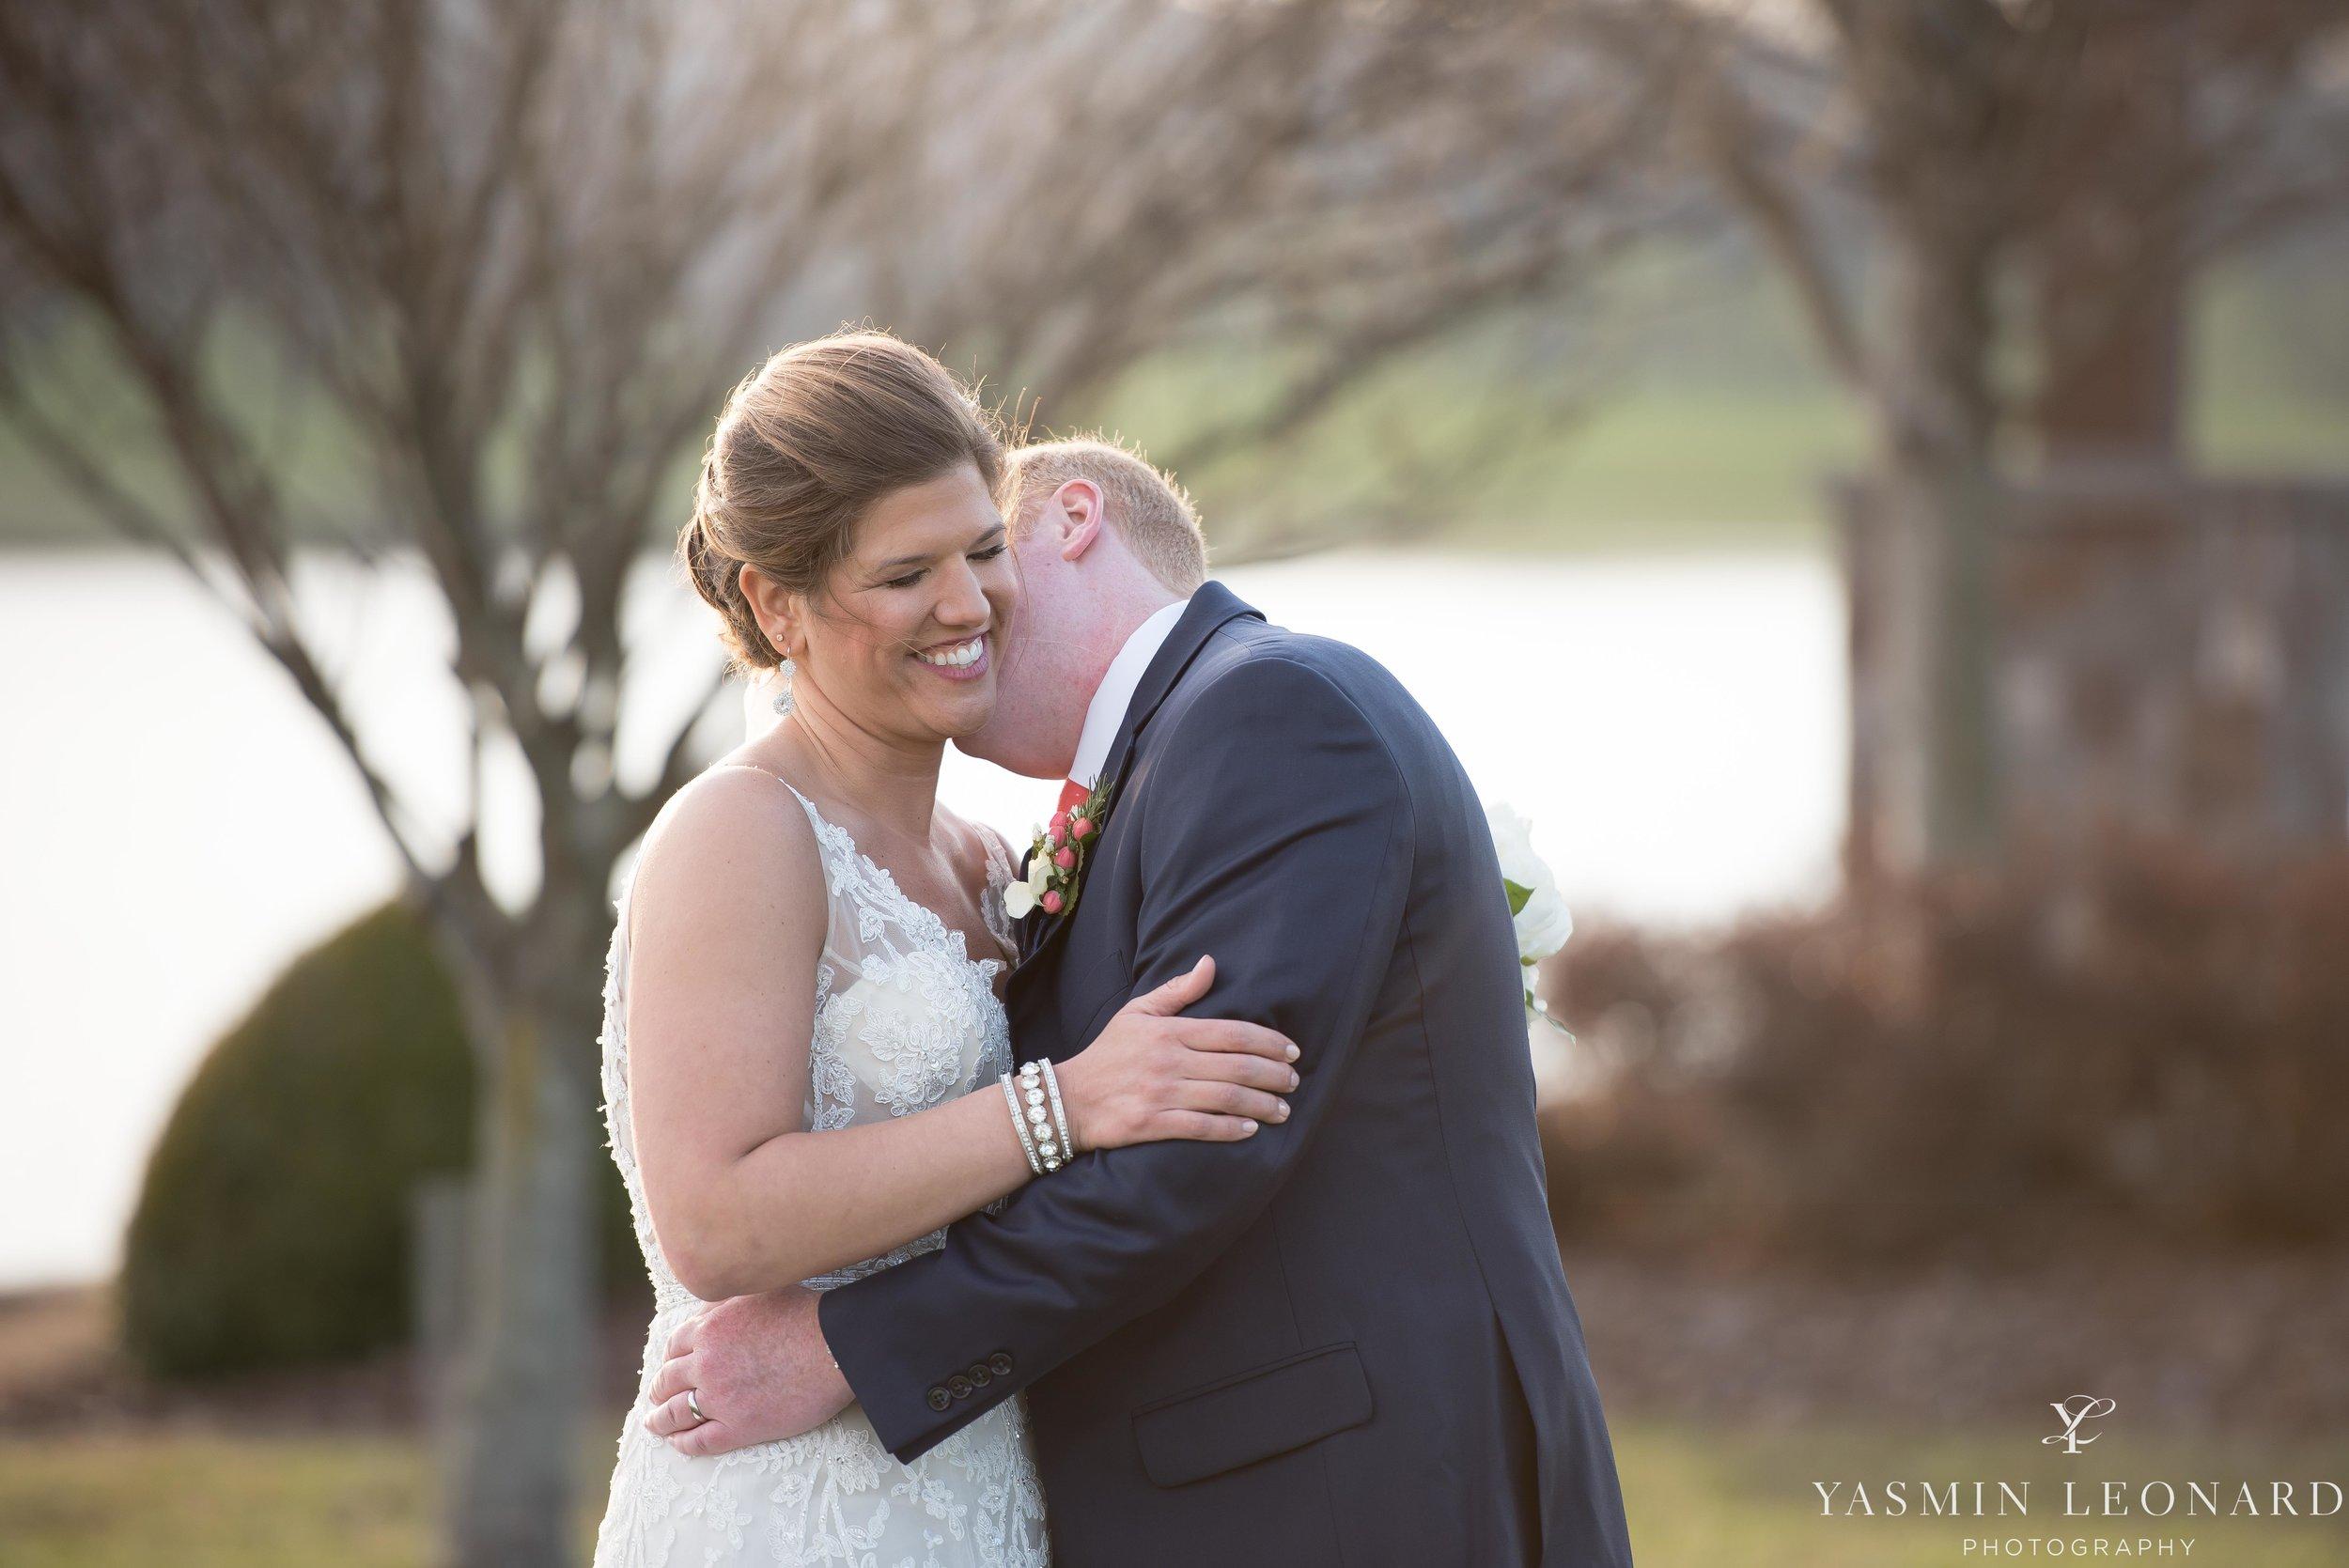 Adaumont Farm - Adaumont Farm Weddings - Trinity Weddings - NC Weddings - Yasmin Leonard Photography-43.jpg